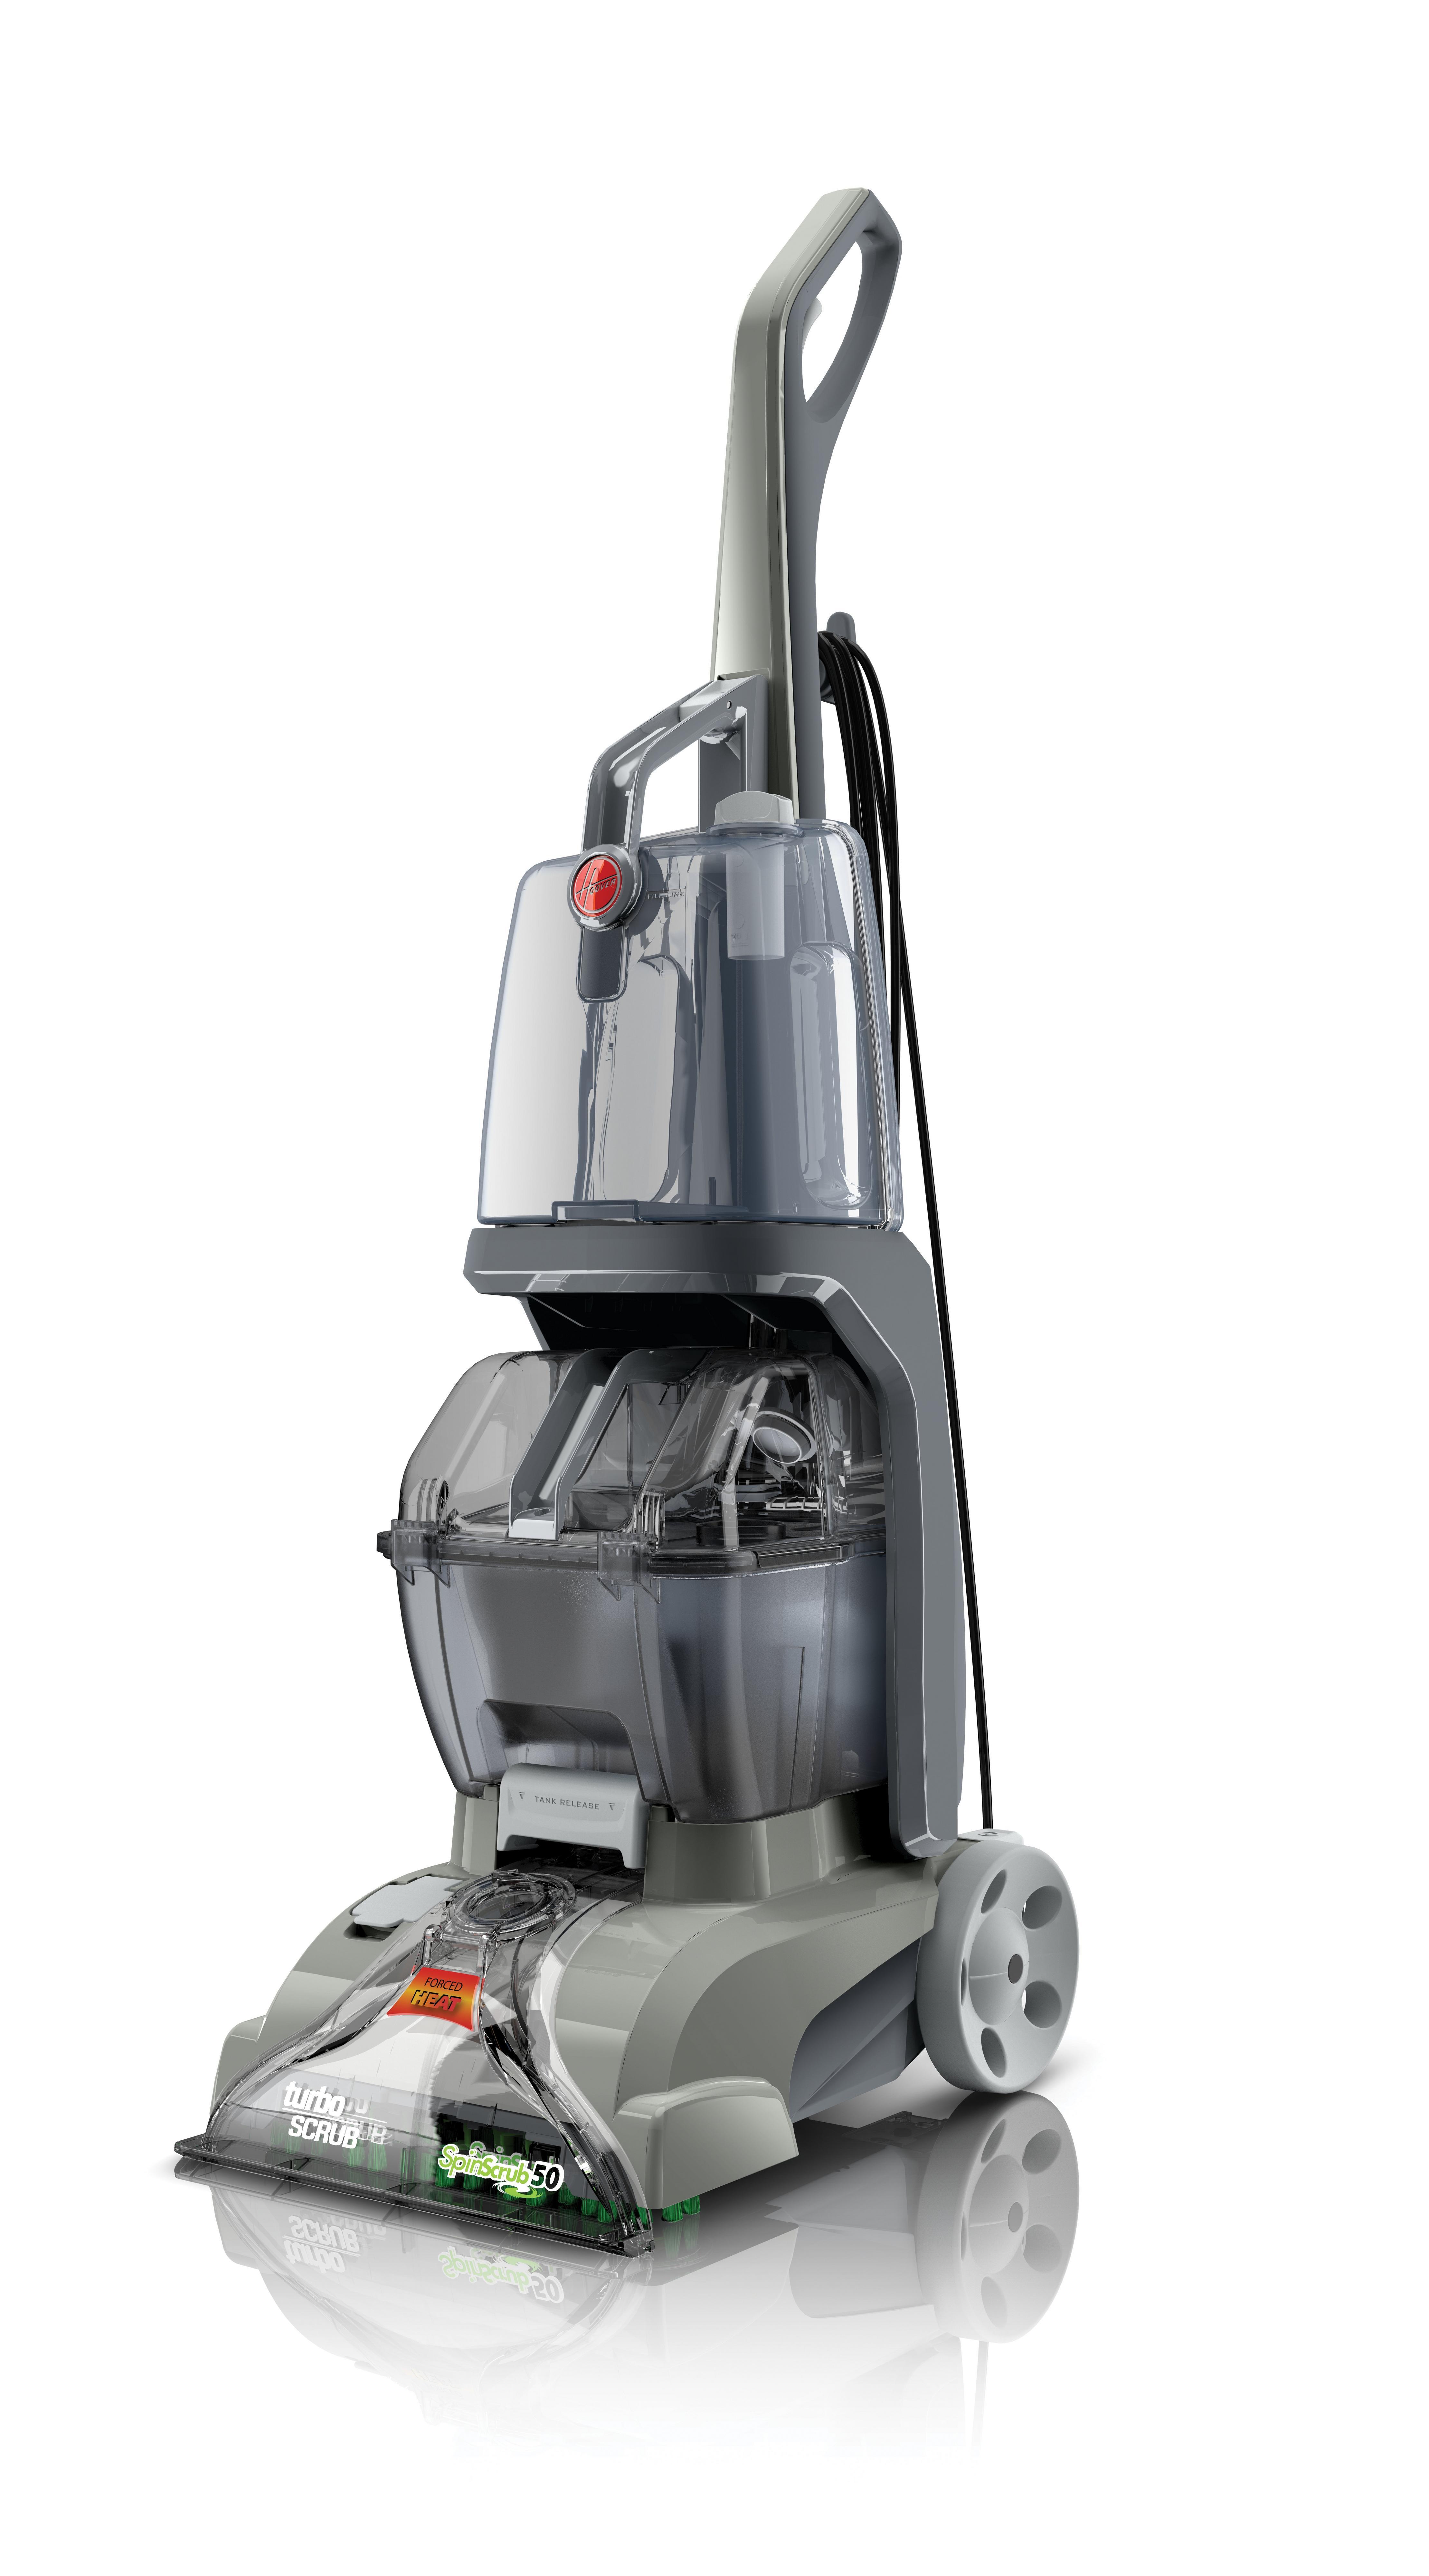 Turbo Scrub Carpet Cleaner2